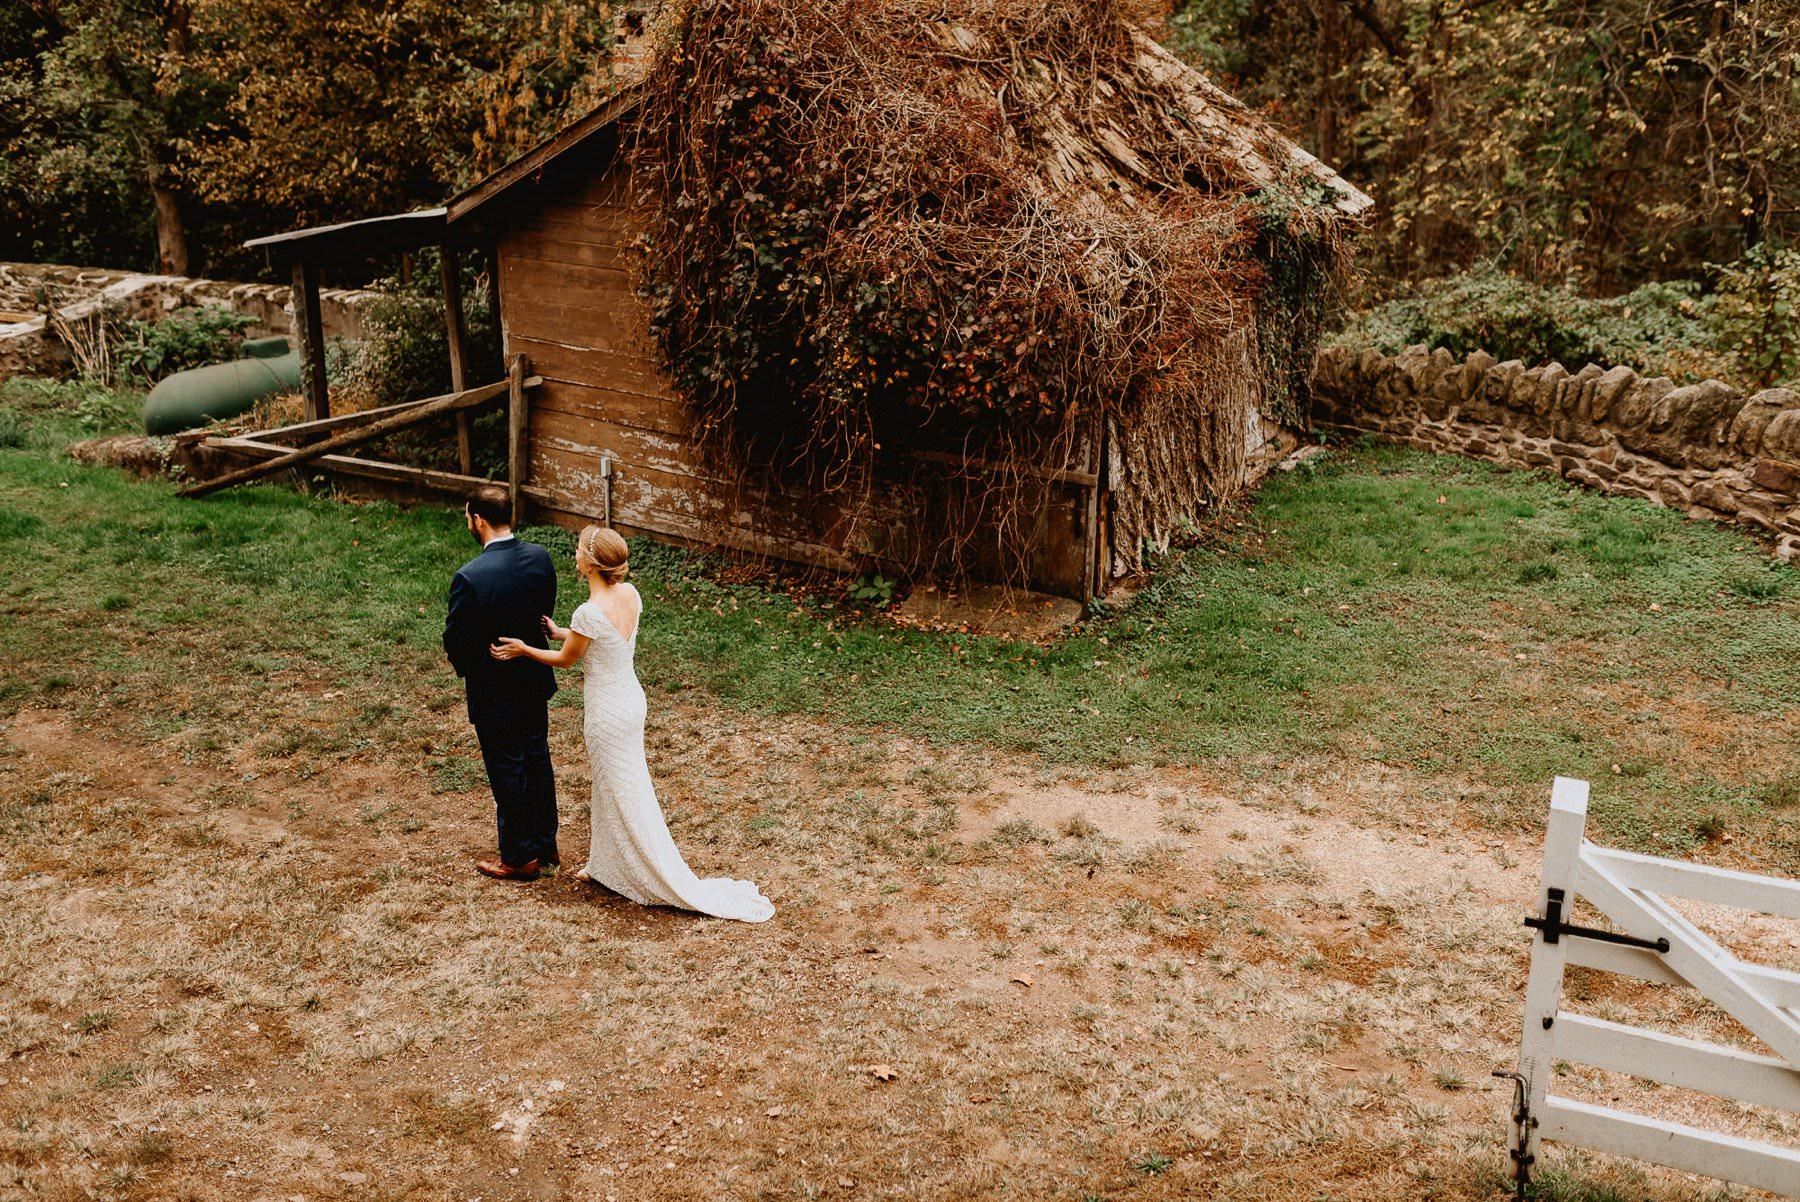 John_James_Audubon_Center_wedding-8.jpg